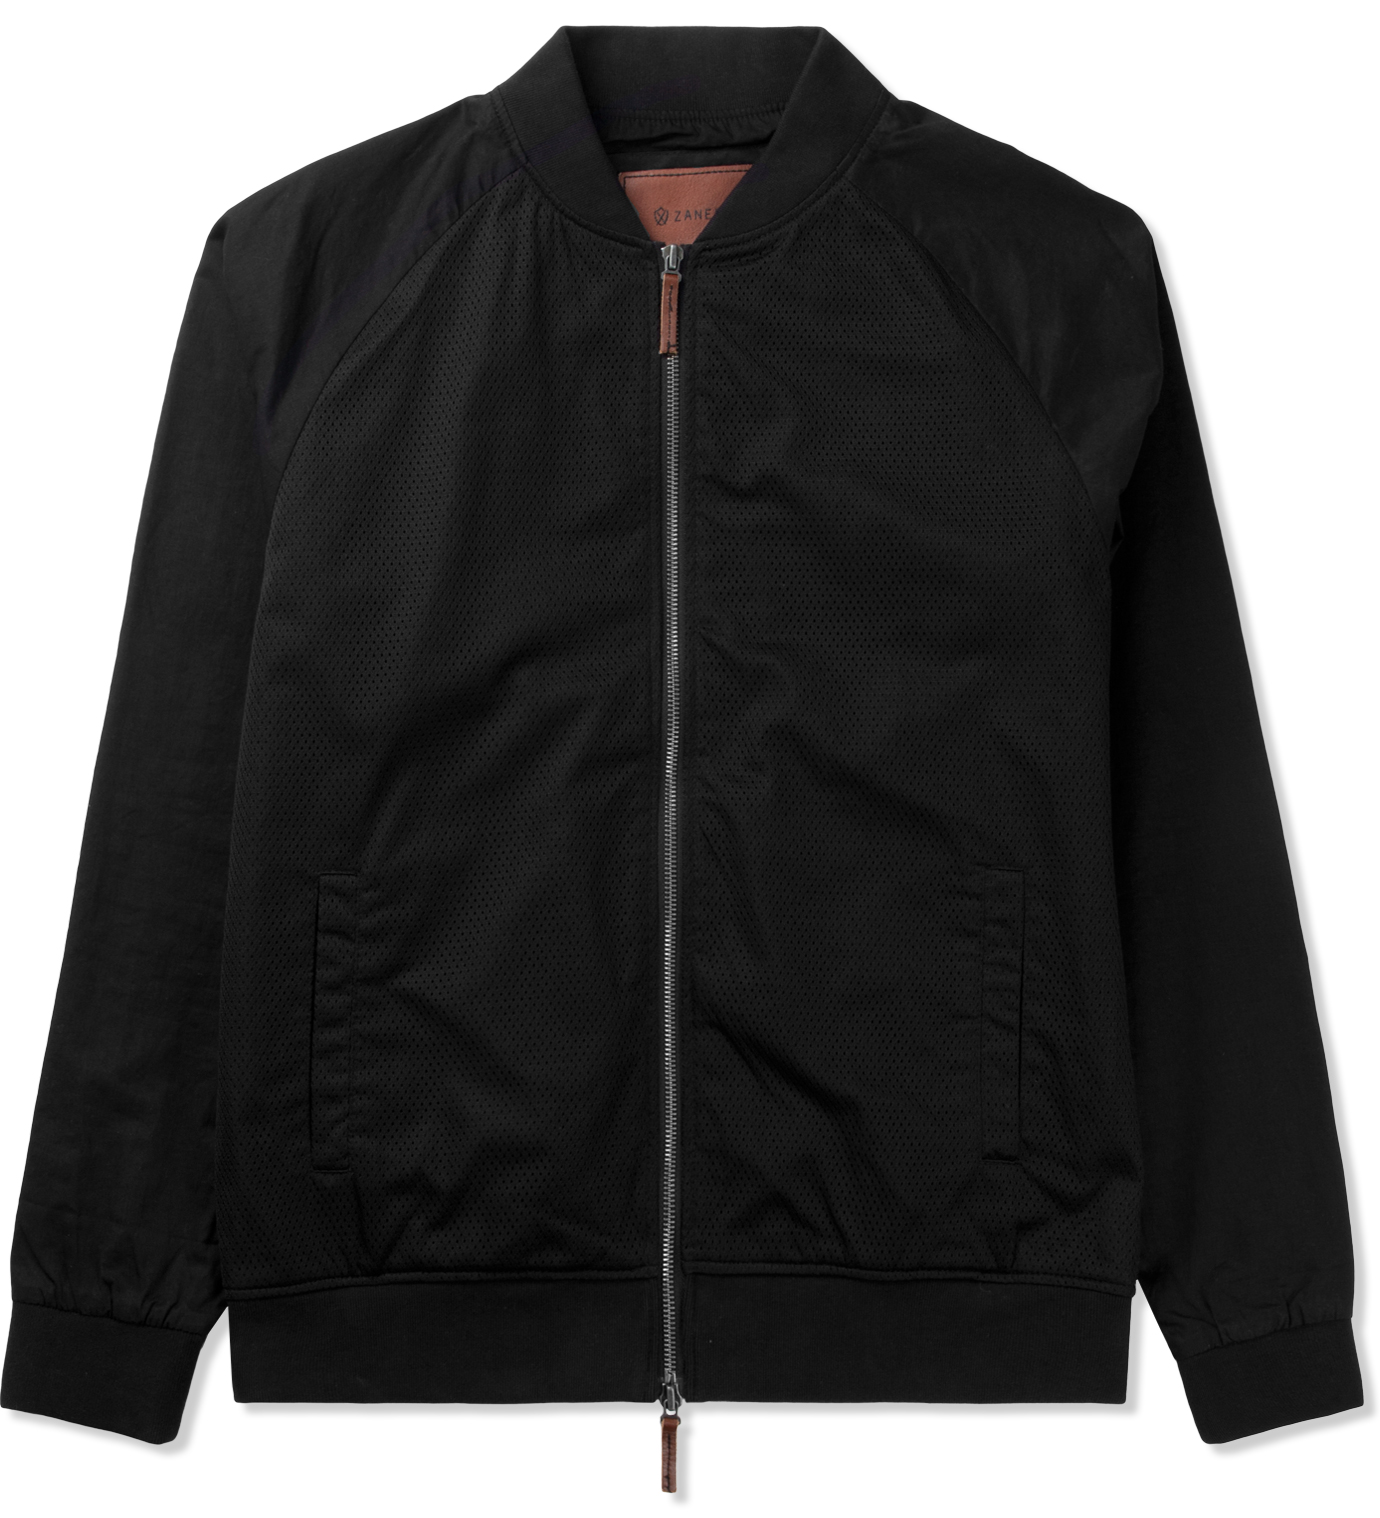 ZANEROBE Black Dugout Bomber Jacket